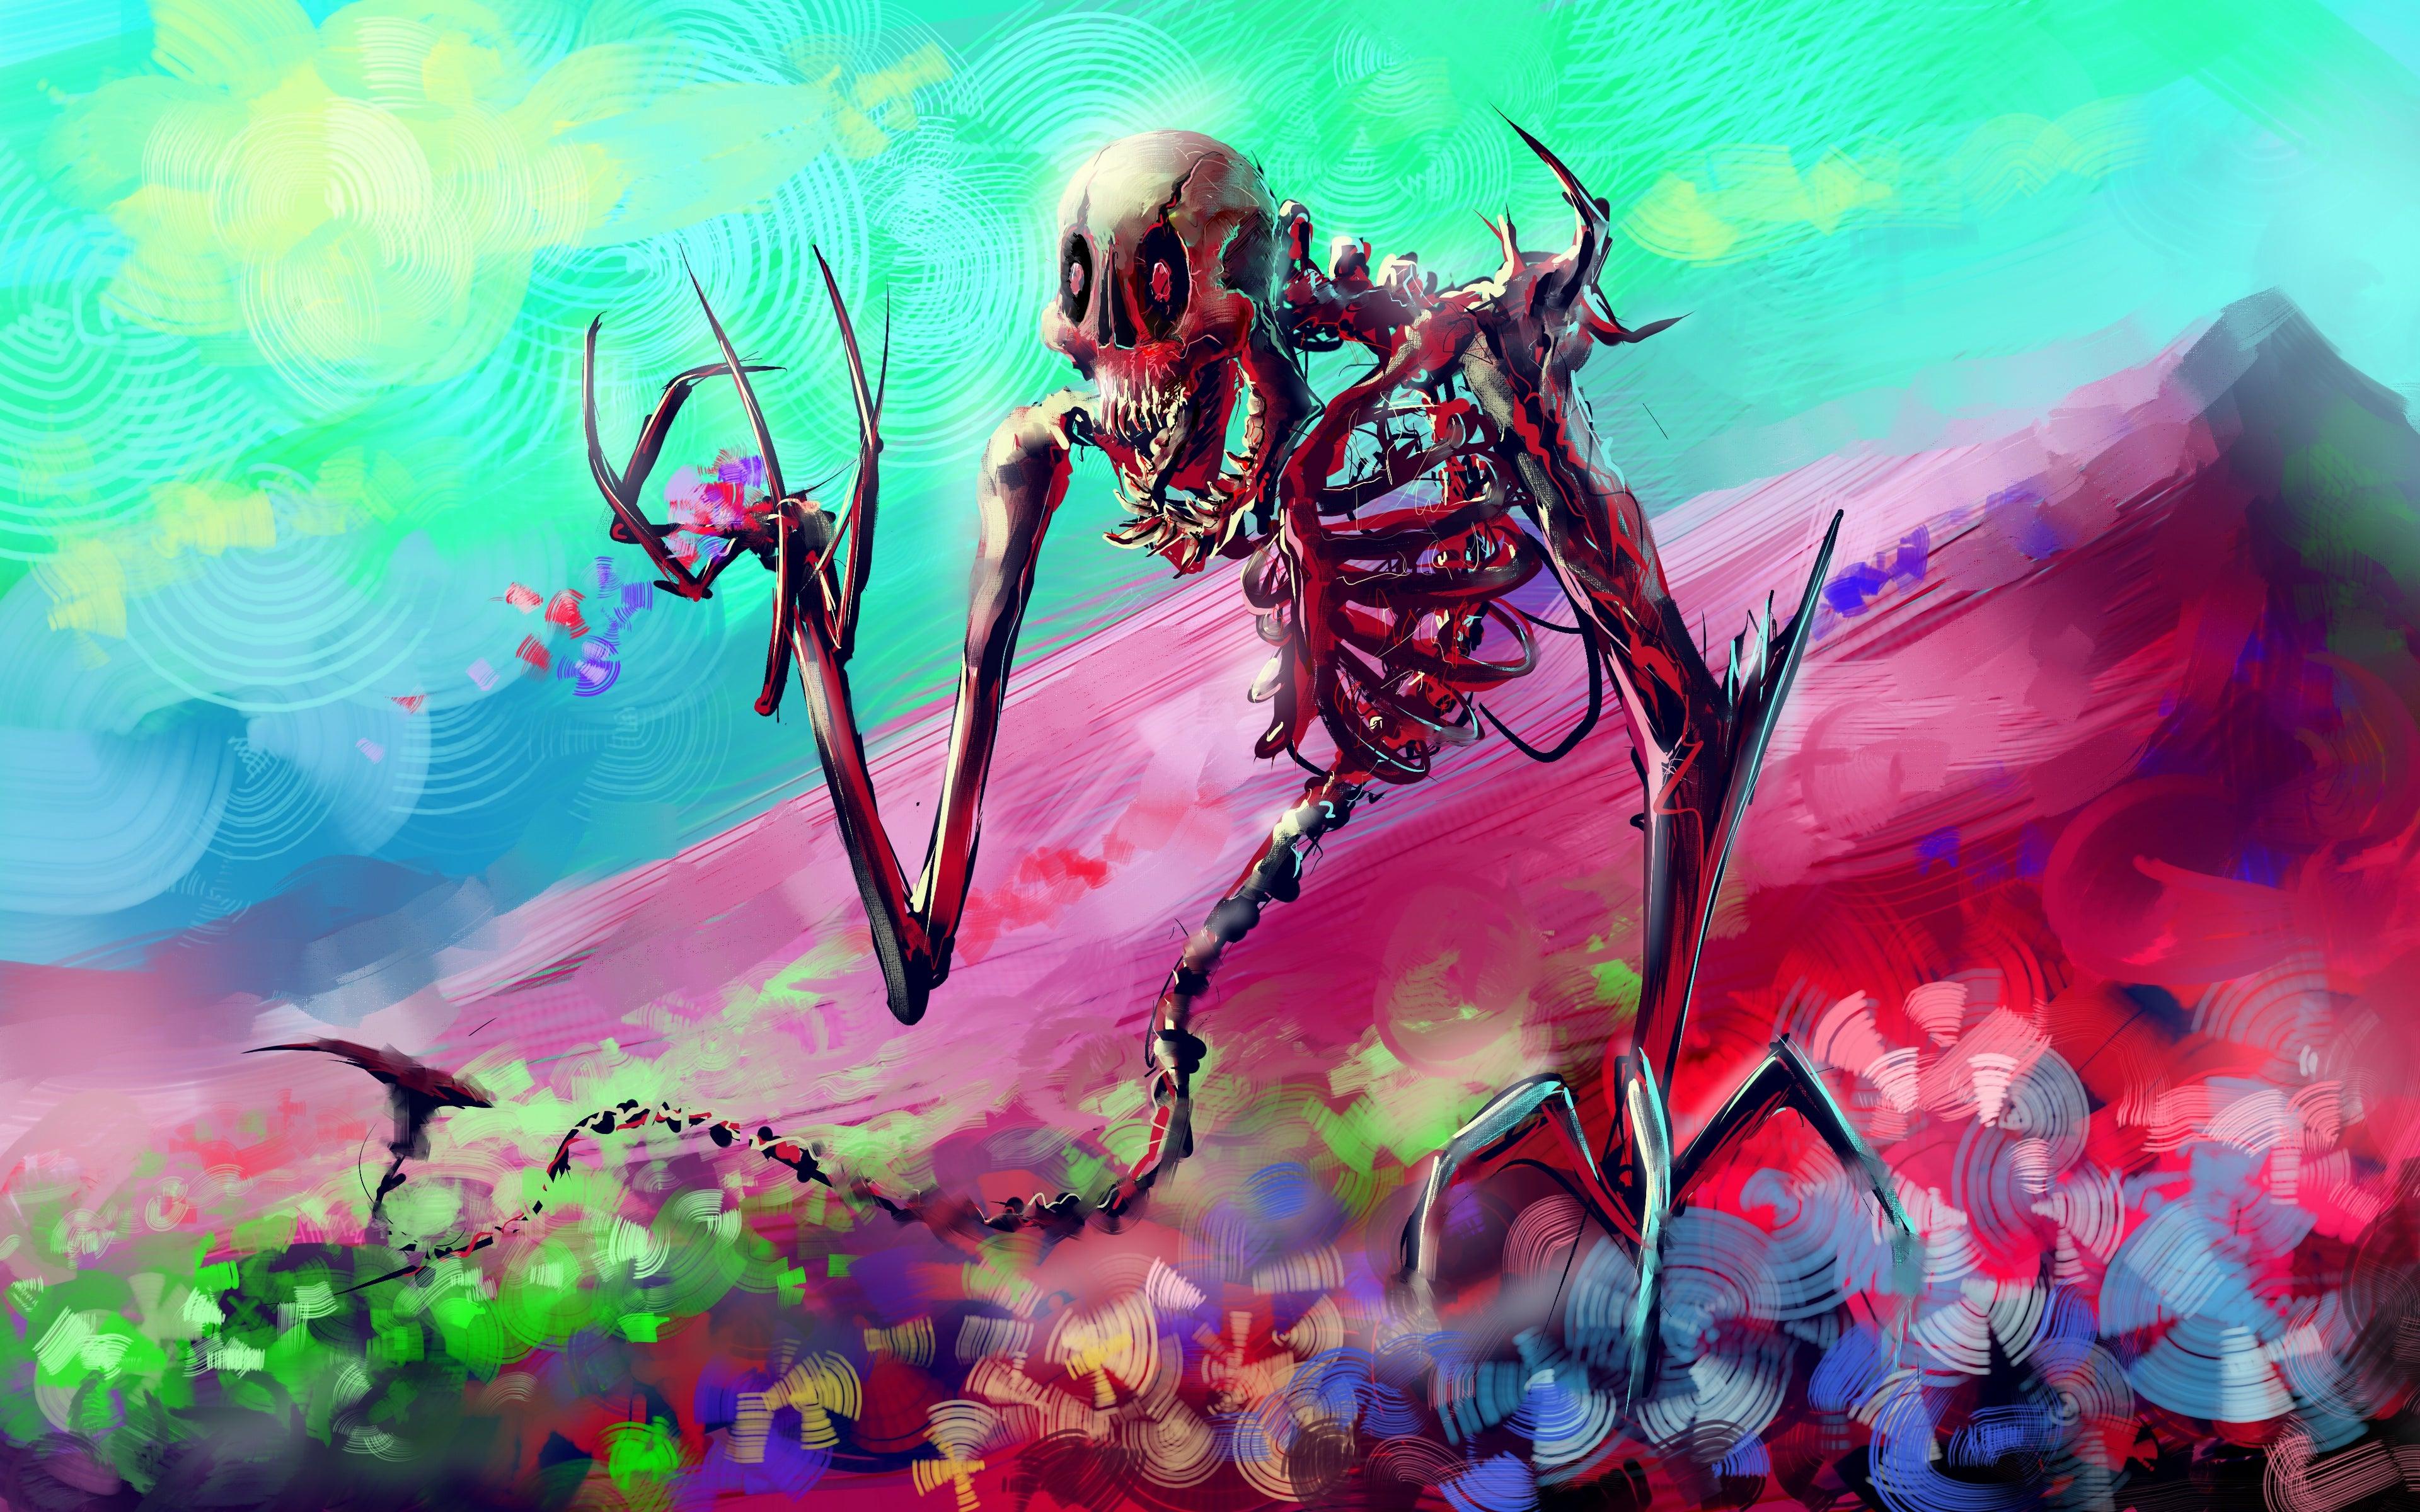 Skeleton Art Bright Colorful 4k Wallpaper